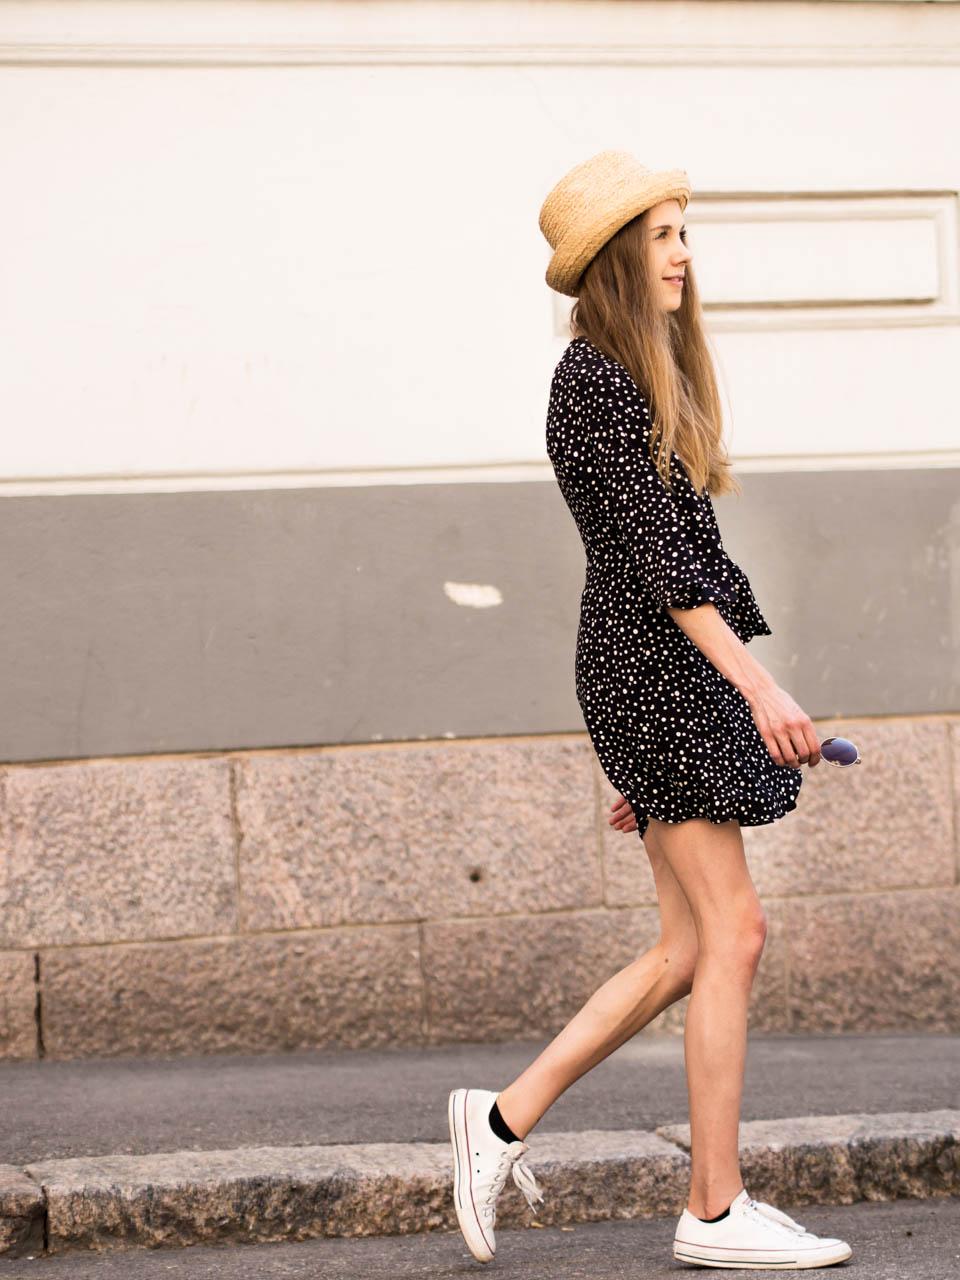 fashion-blogger-summer-outfit-inspiration-polka-dot-dress